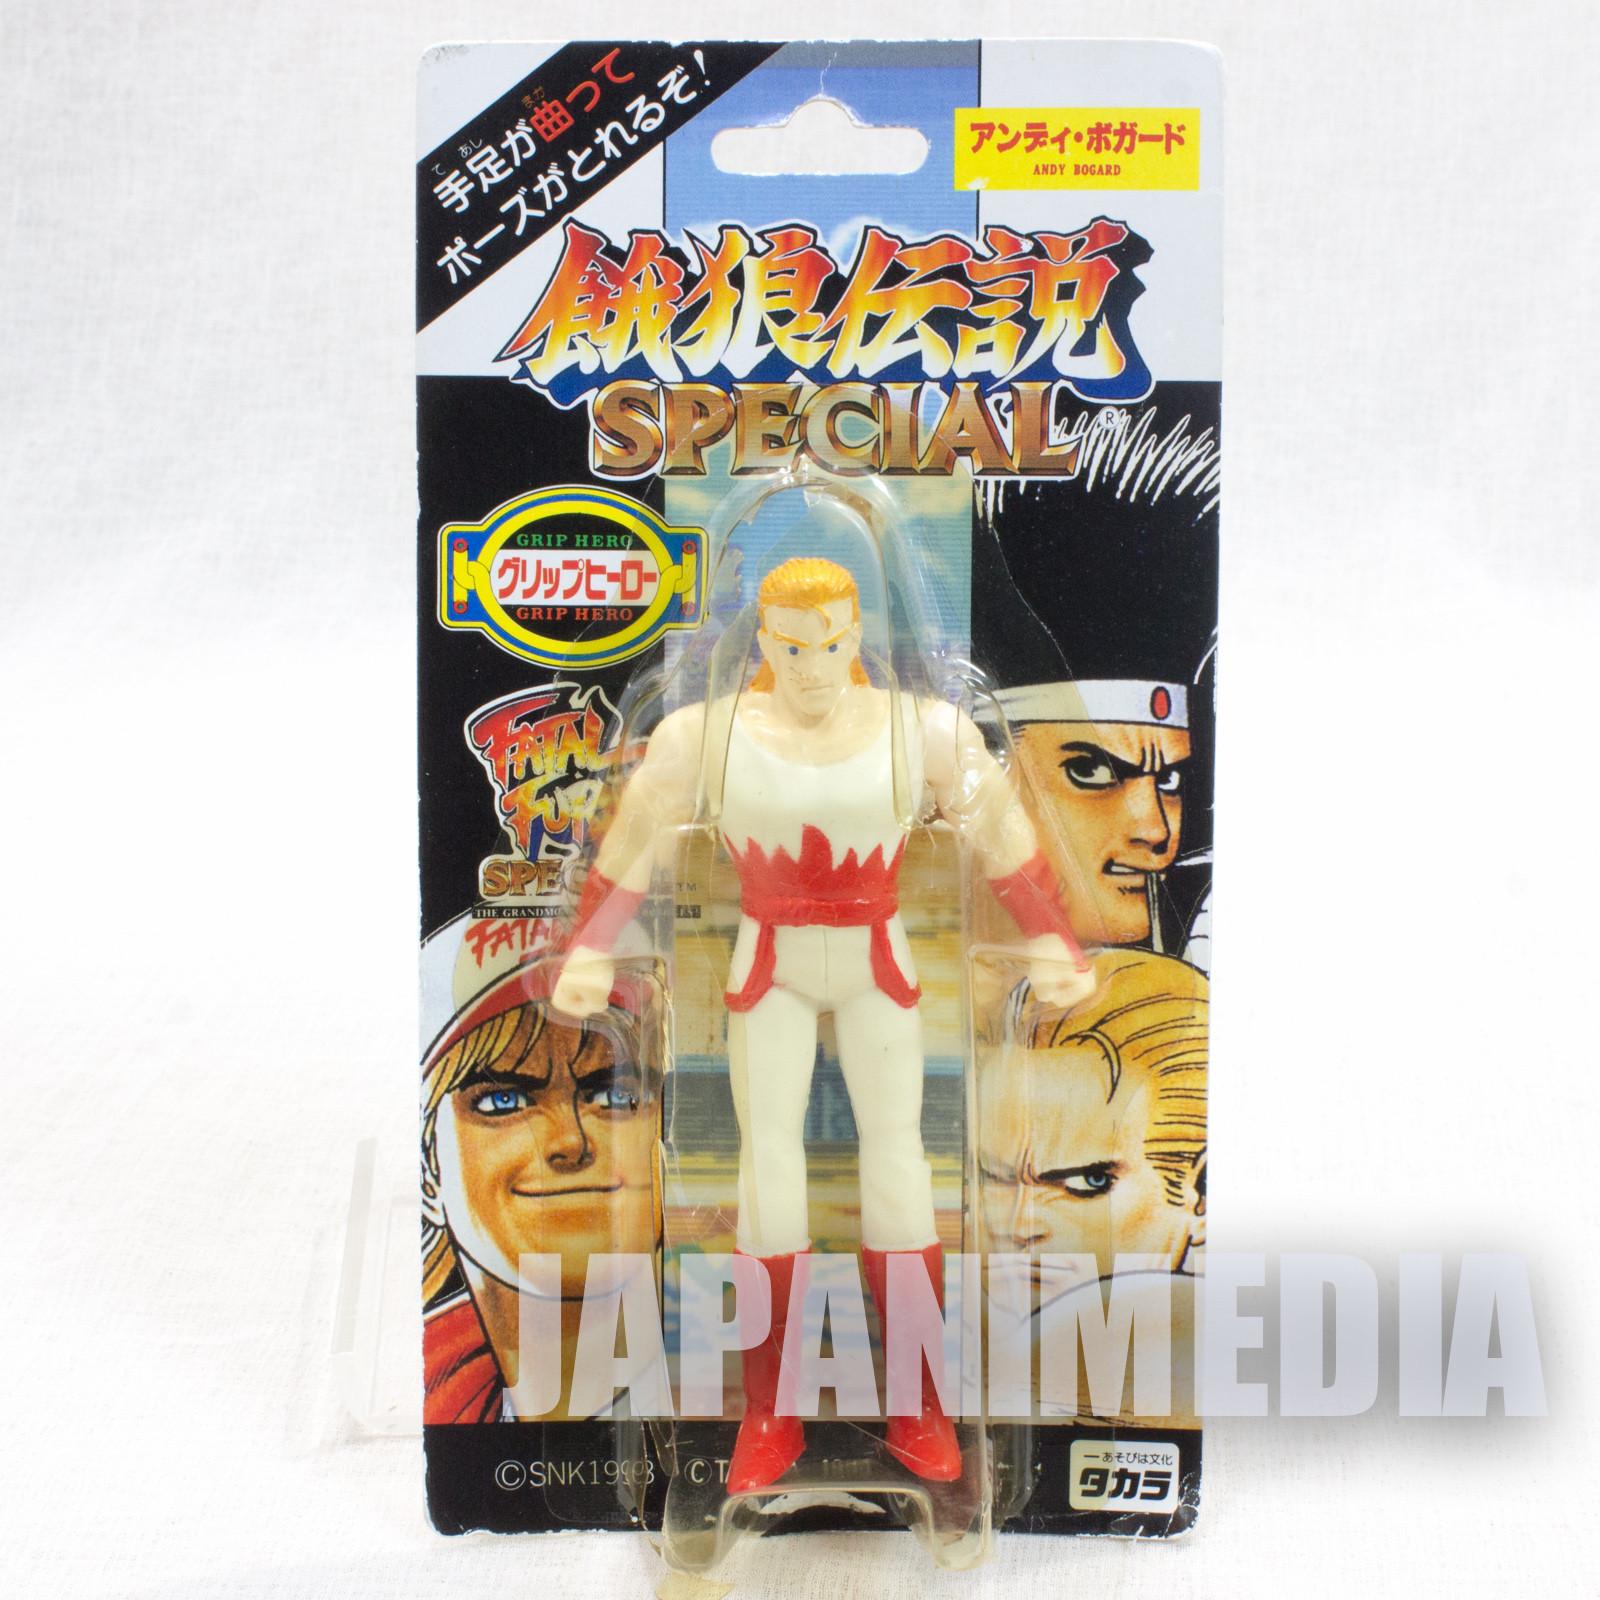 RARE! Fatal Fury Special Andy Bogard Mini Action Figure Grip Hero SNK JAPAN